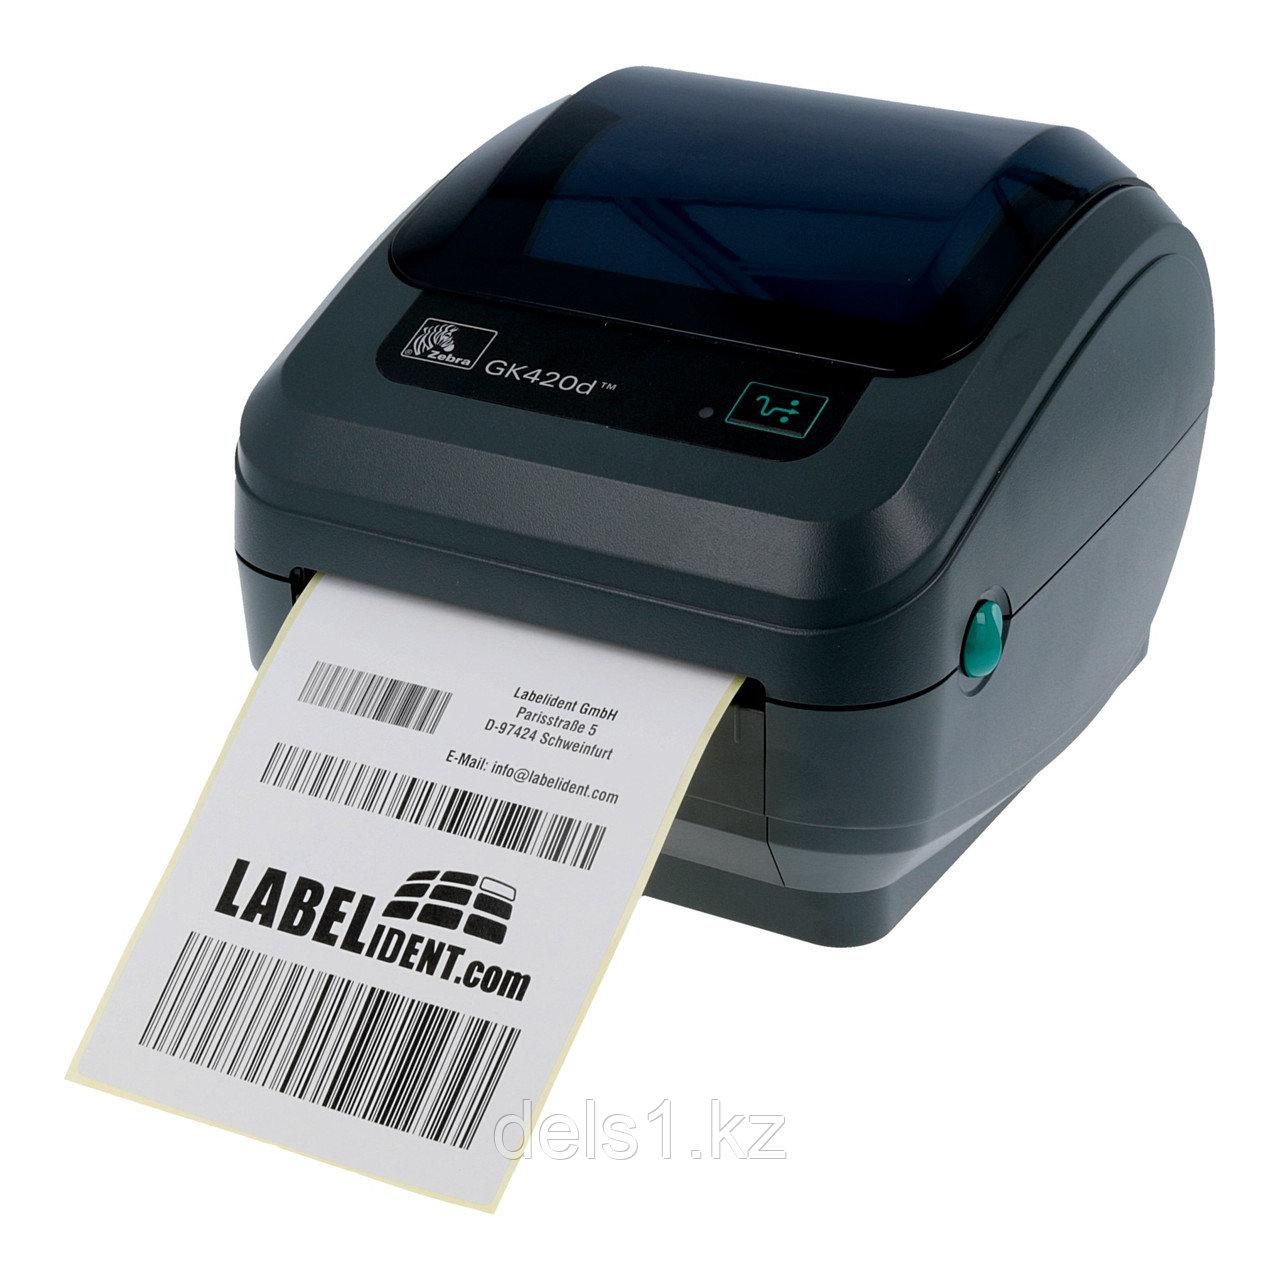 Термо-принтер этикеток Zebra GK420d (снят с производства)